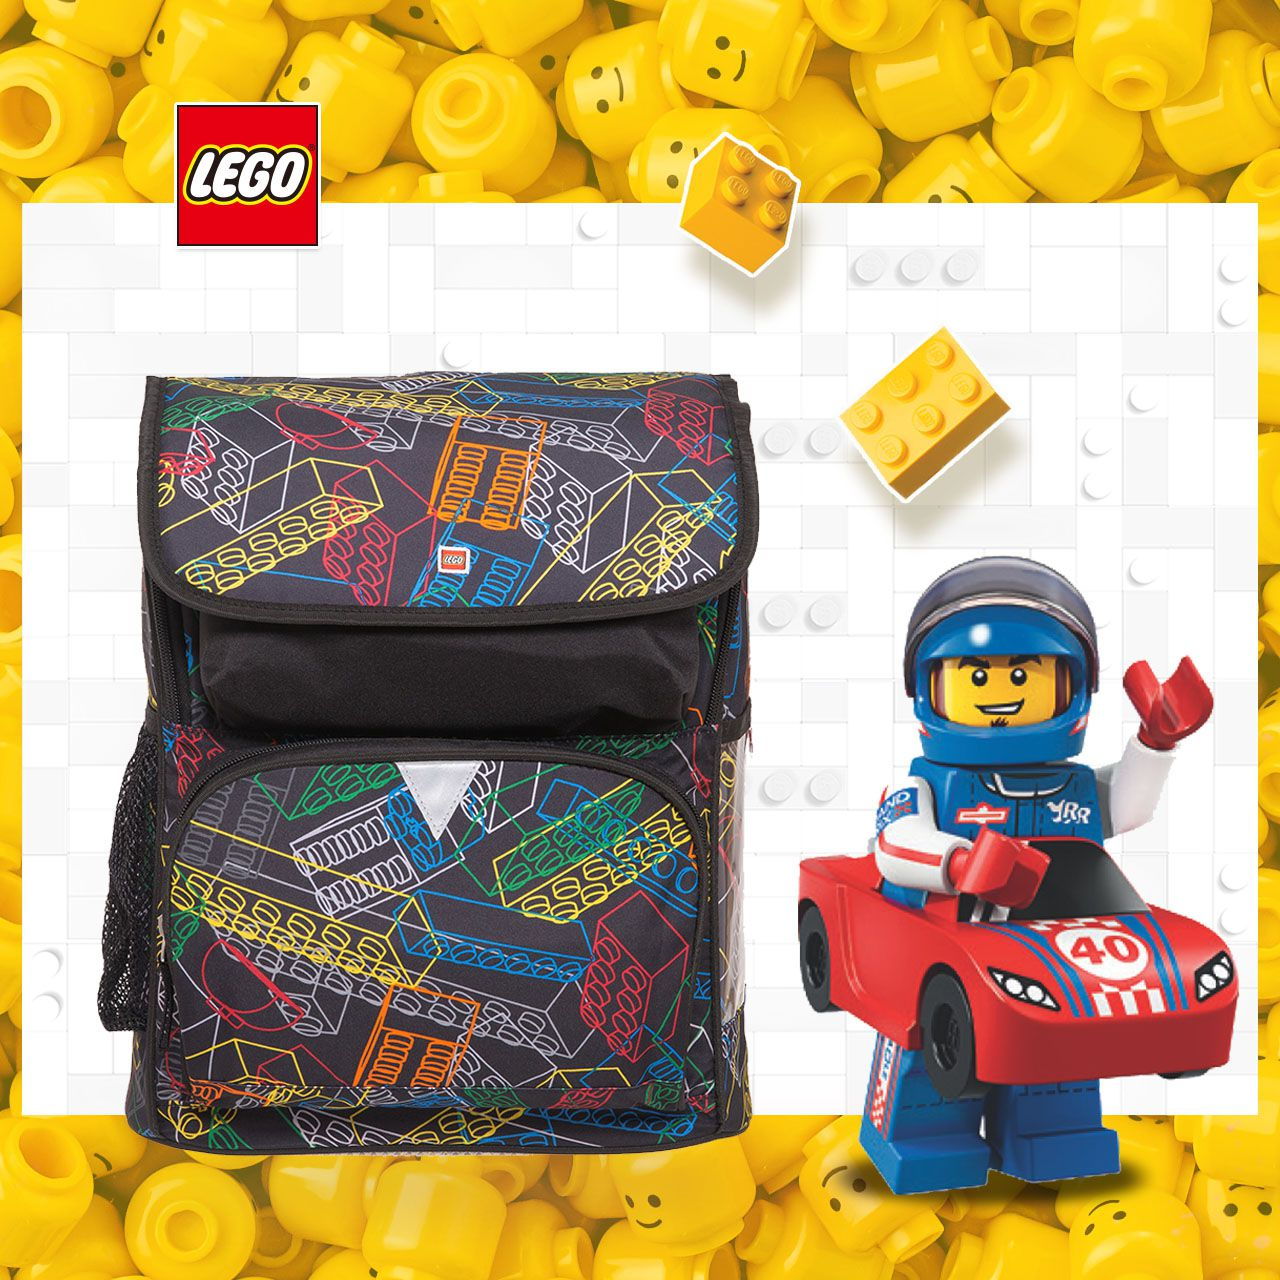 LEGO丹麥樂高書包Recruiter-彩色積木 20069-1816